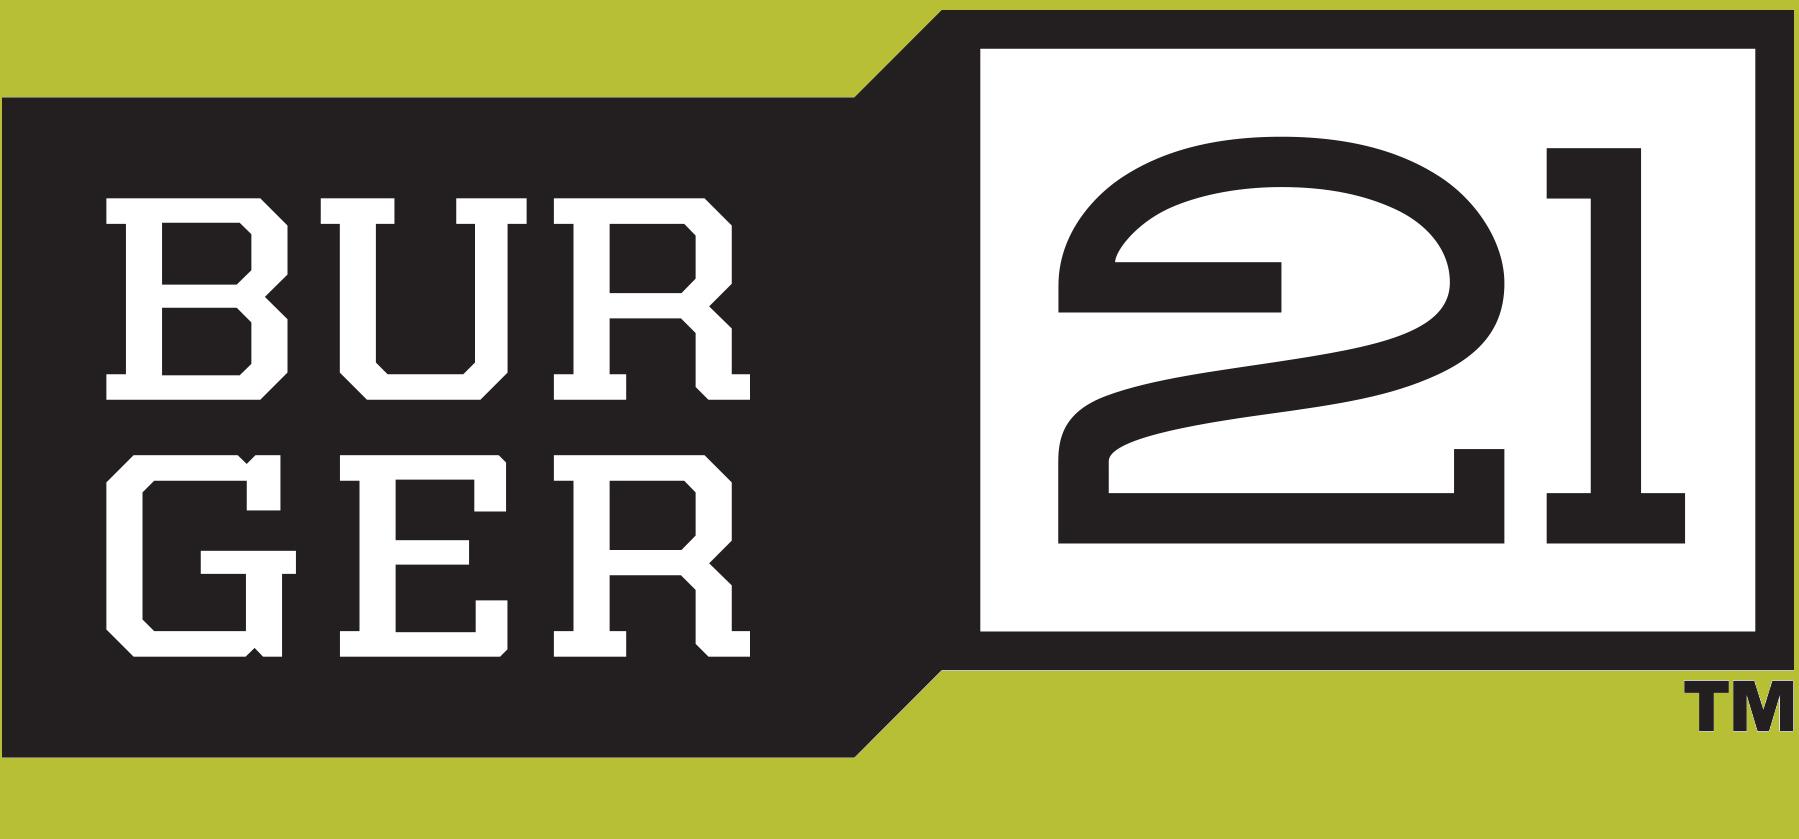 16-BGR-Intl-0068 LogoFiles_Burger21_NOTAG